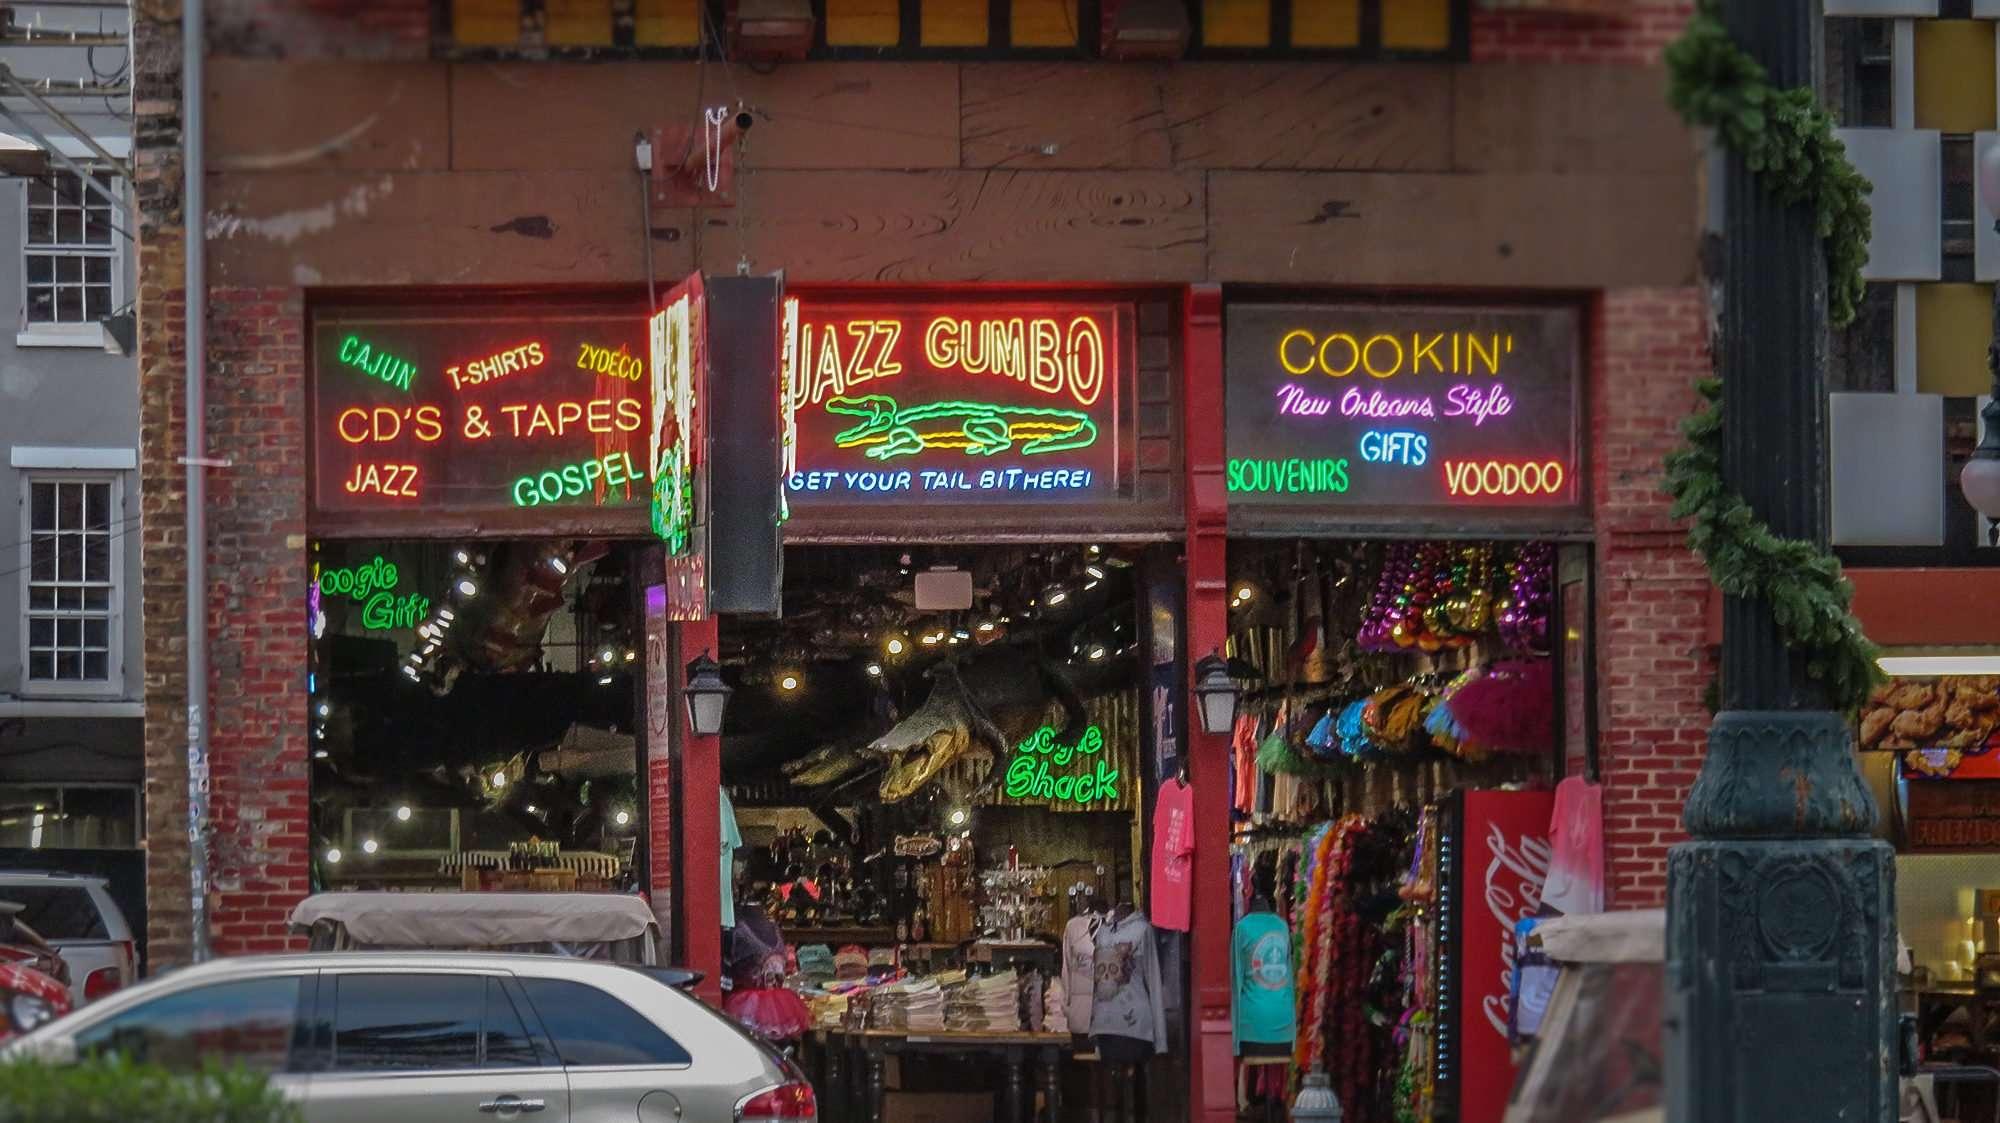 Jan 9, 2017 - jazz Gumbo, Canal Street, New Orleans/photonews247.com